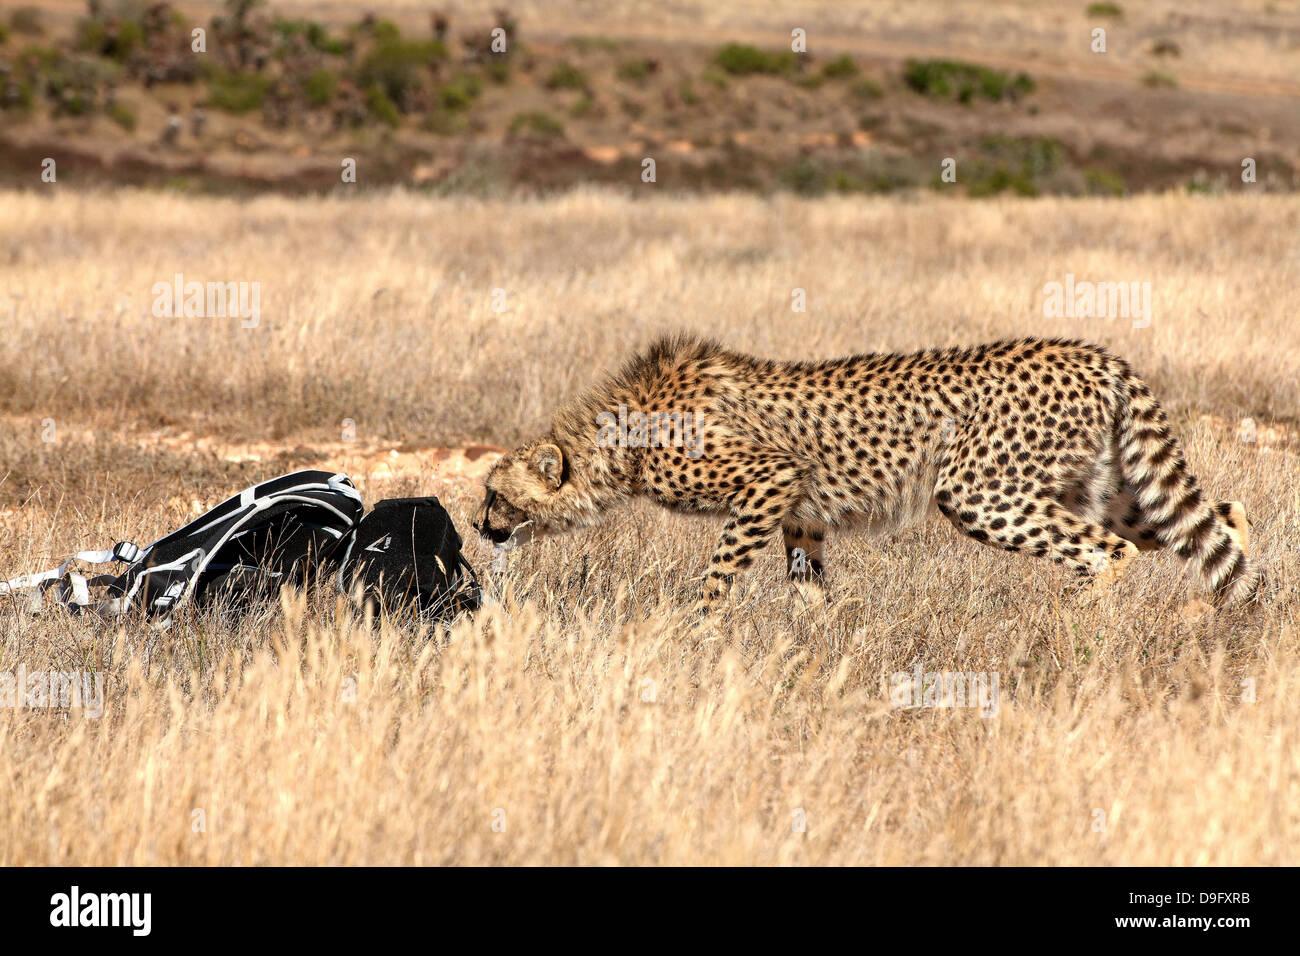 Curioso cheetah olfateando a los amantes de la naturaleza de la mochila, Western Cape, Sudáfrica, África Imagen De Stock